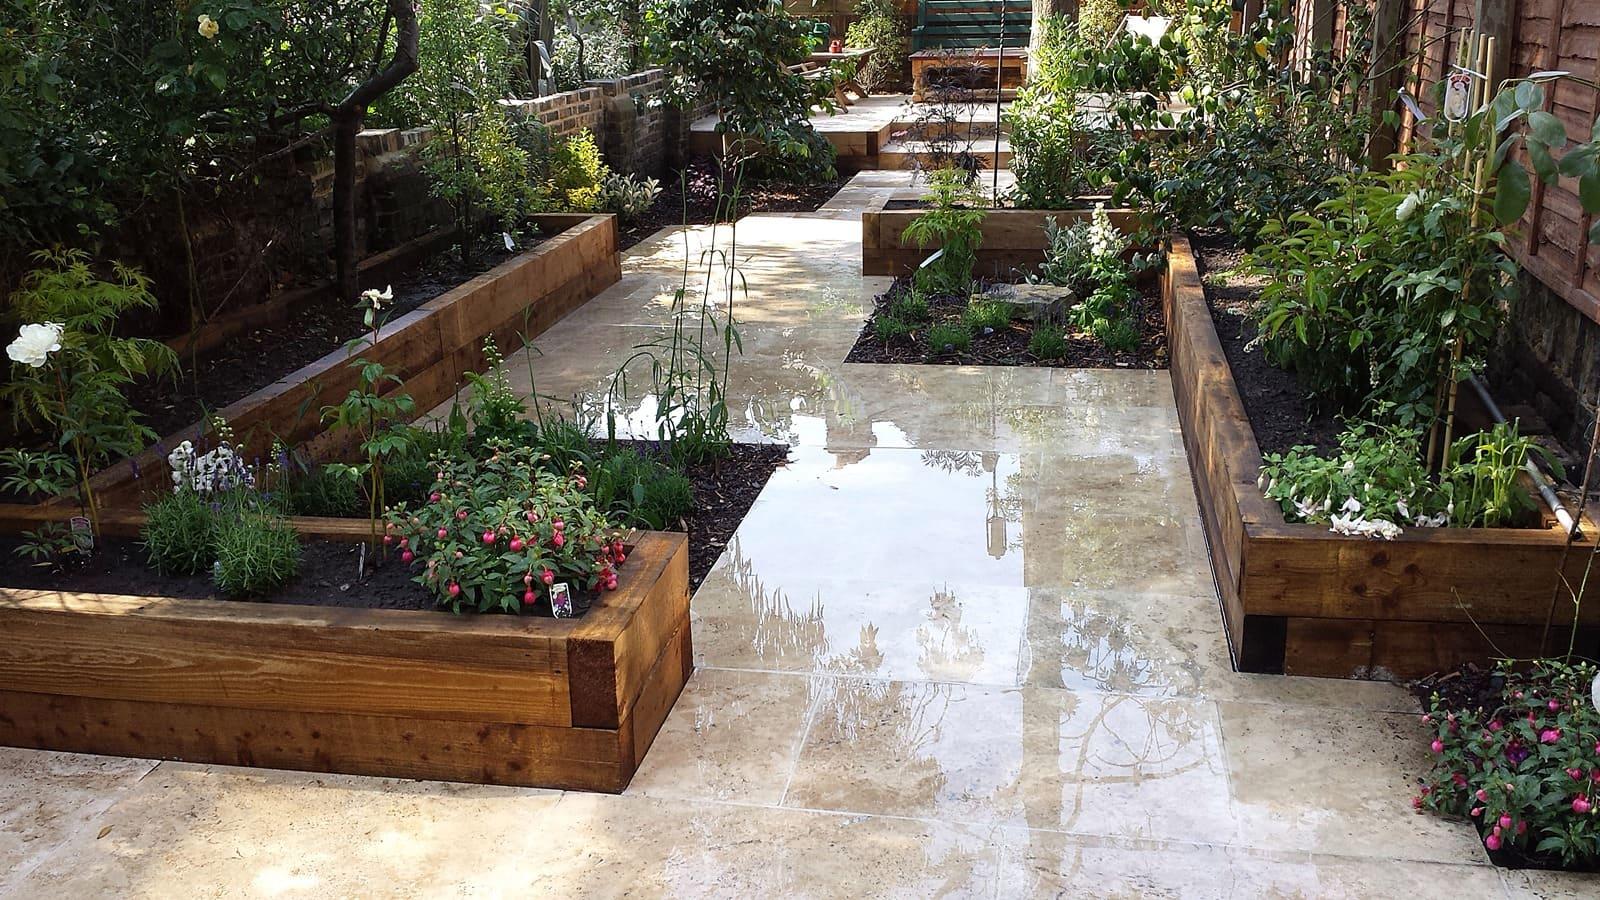 3.Simphome.com Garden with Travertine Pavers 1